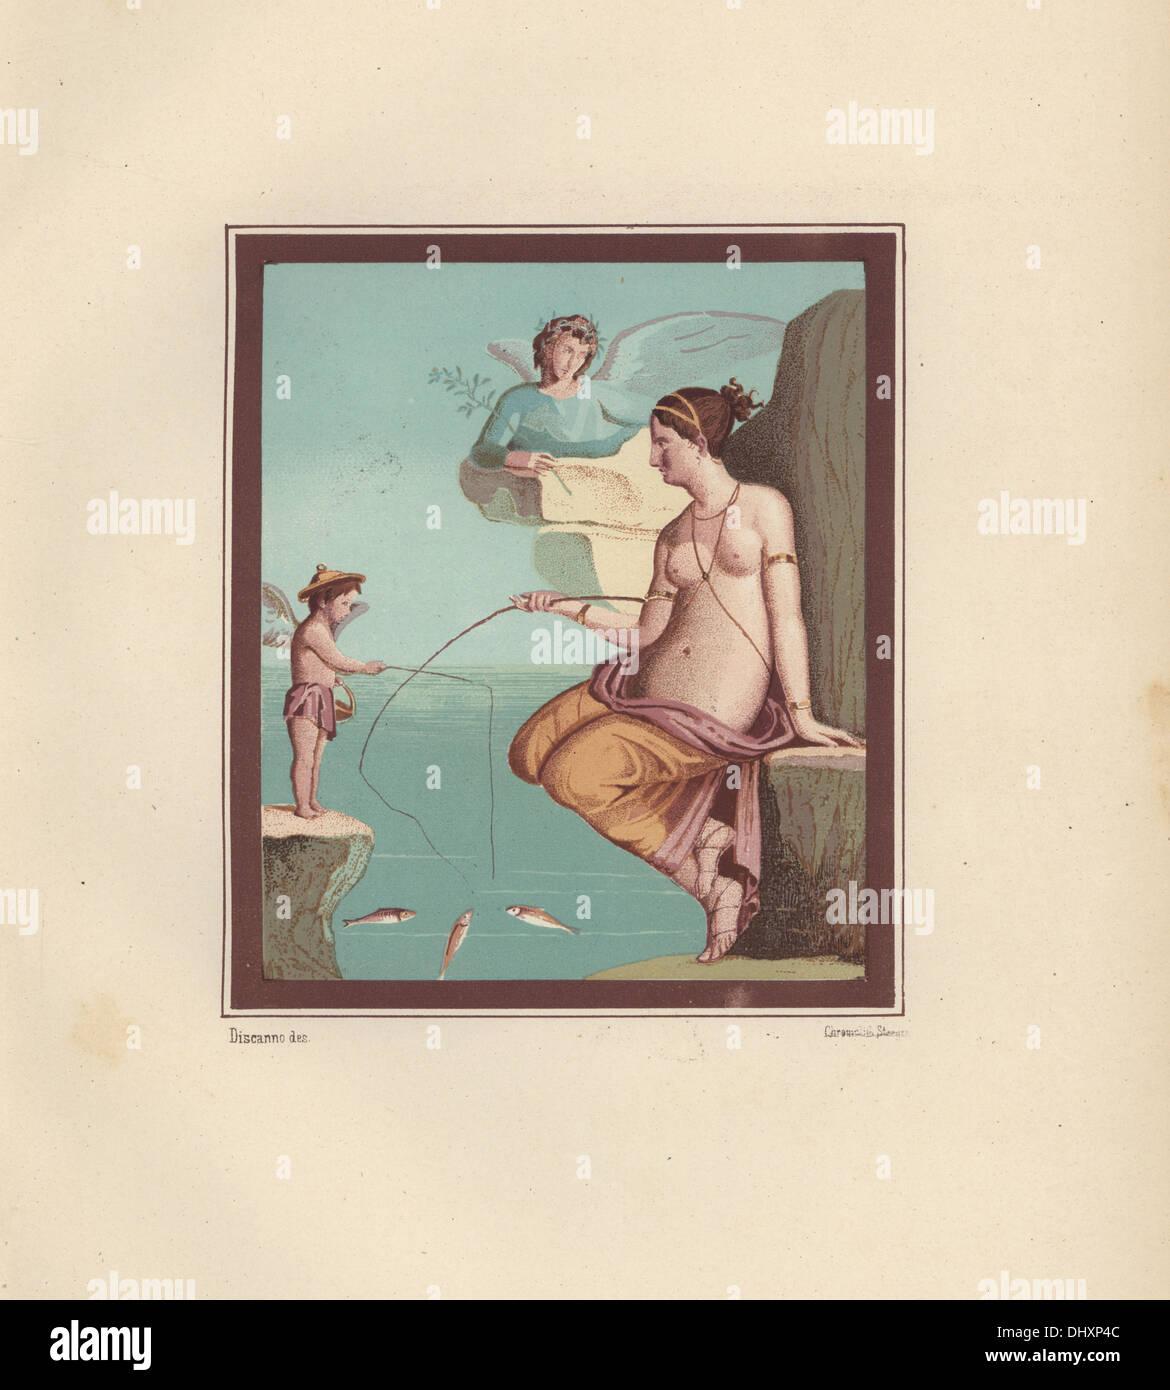 Wall painting of Venus and Amor fishing. - Stock Image